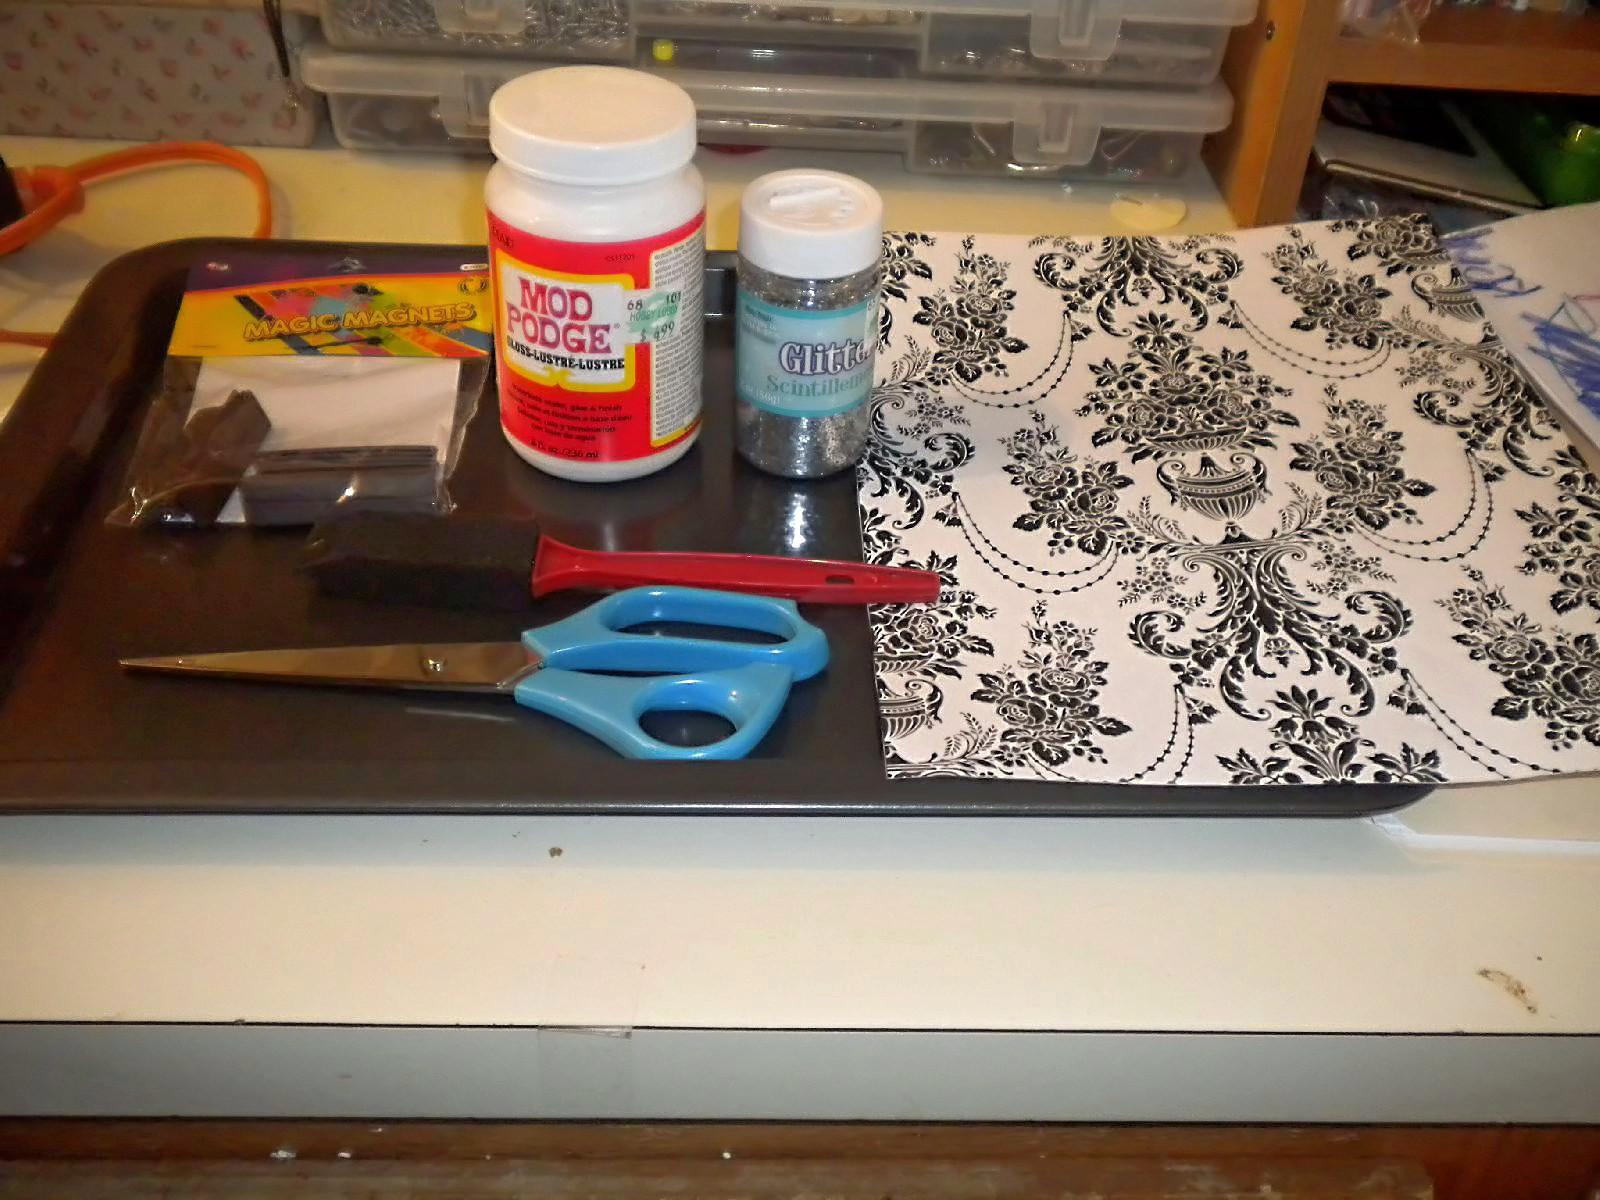 Leslie Marquez Designs Diy Magnetic Makeup Organizer How To Build Gun Monday June 18 2012